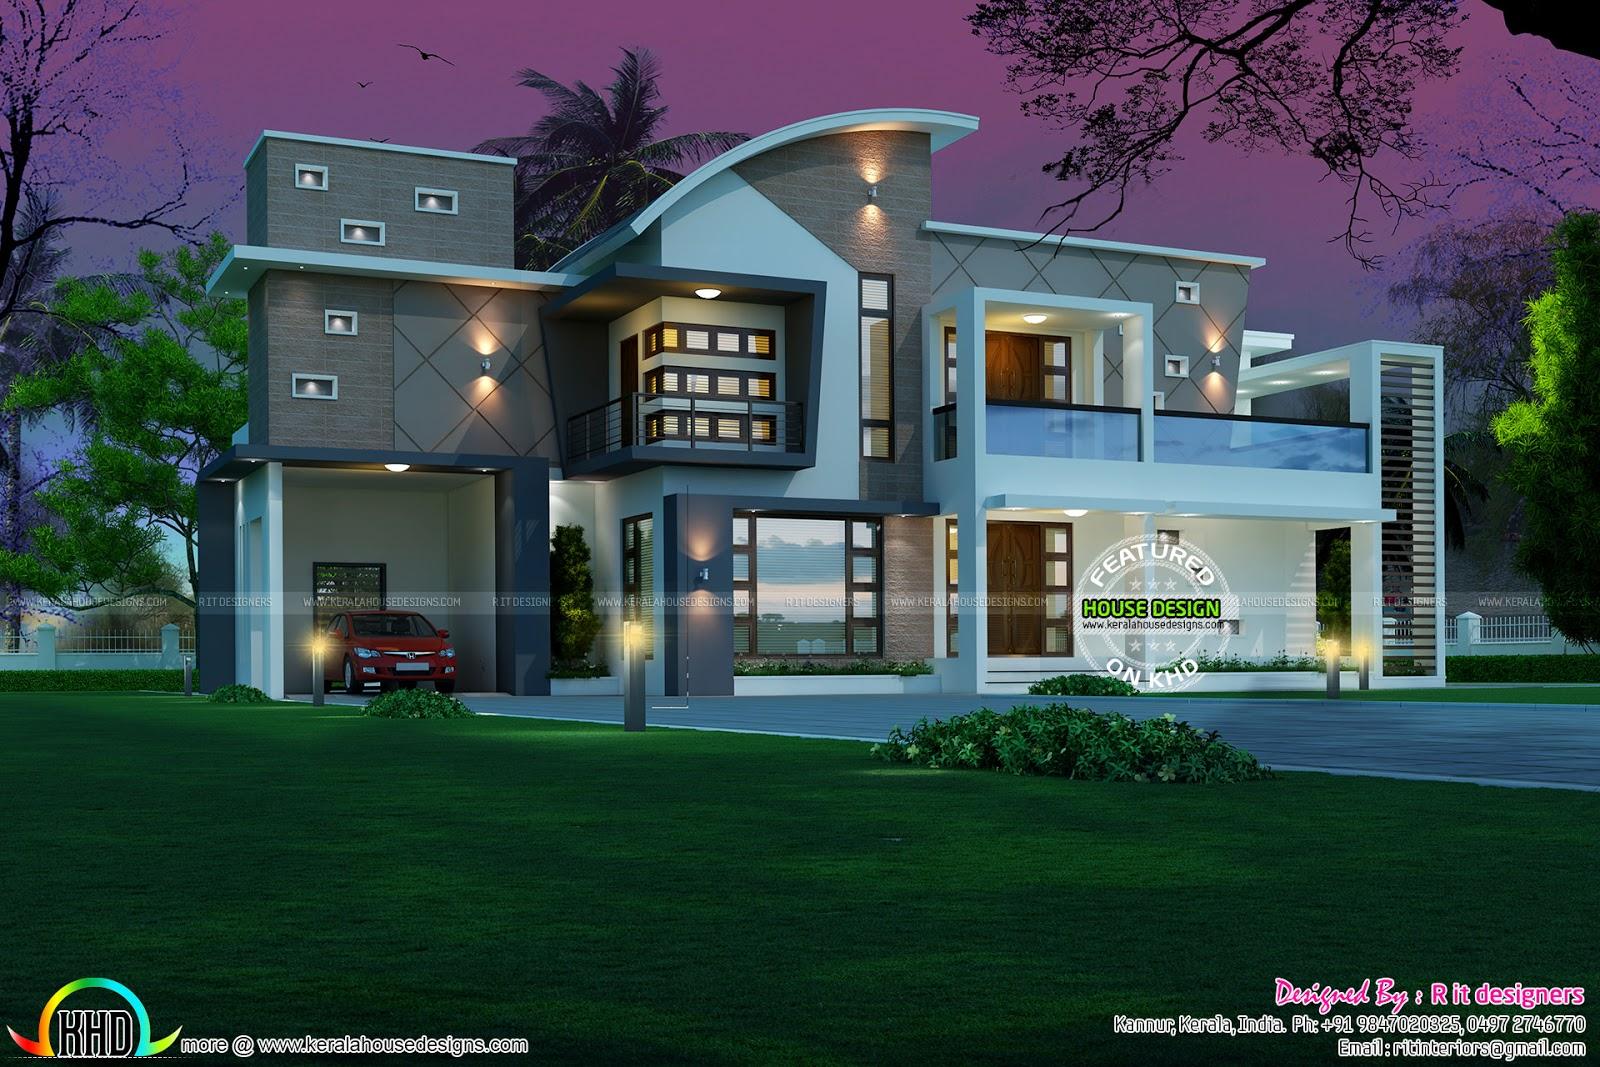 Gandul 2847 Sq Ft House 60 Lakhs Cost Estimated